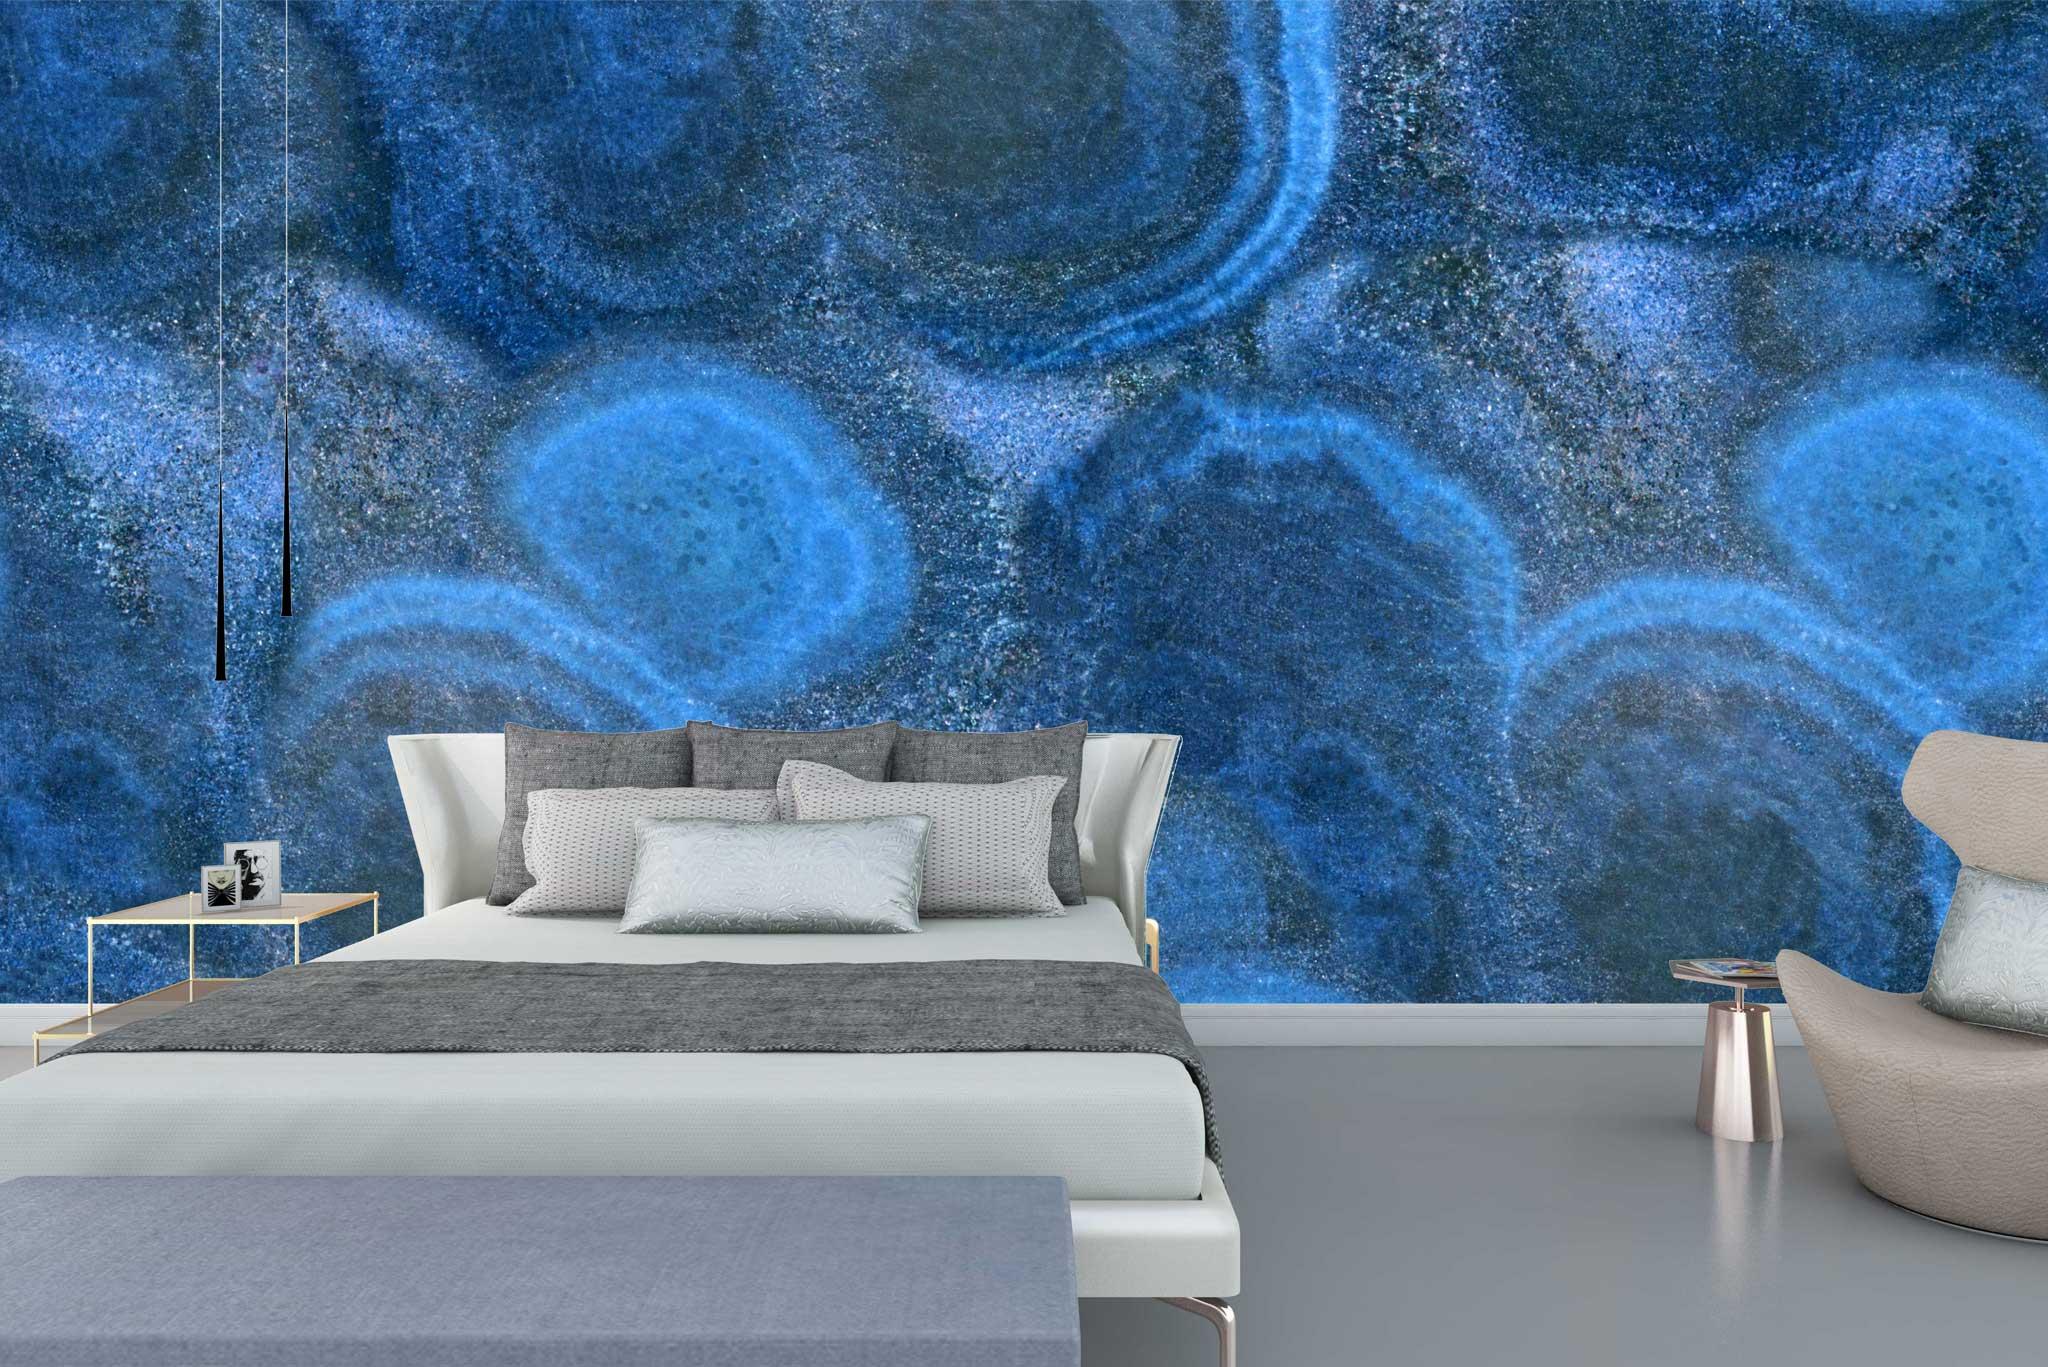 tapet-fototapet-comanda-personalizat-bucuresti-perete-special-lux-model-mineral-piatra-albastra